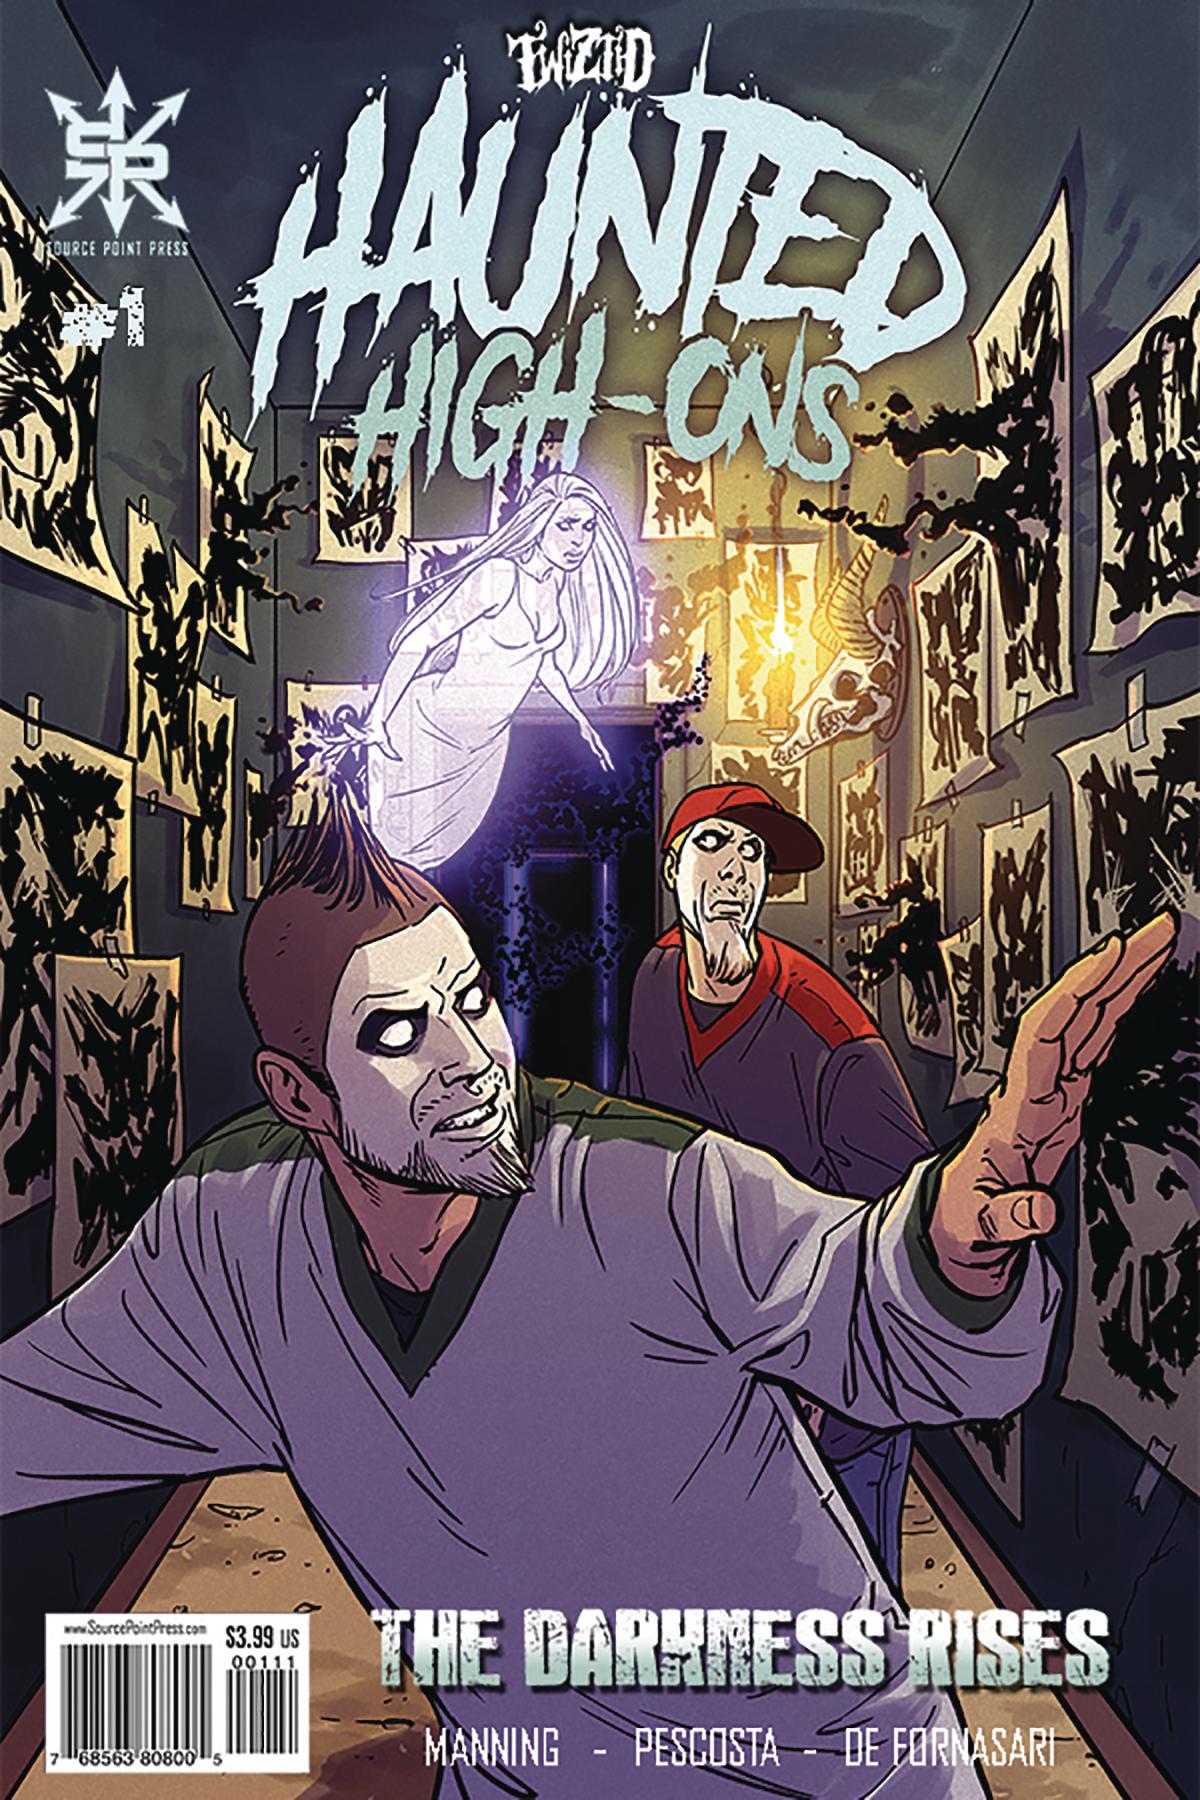 Twiztid Haunted High-Ons: Darkness Rises #1, Twiztid